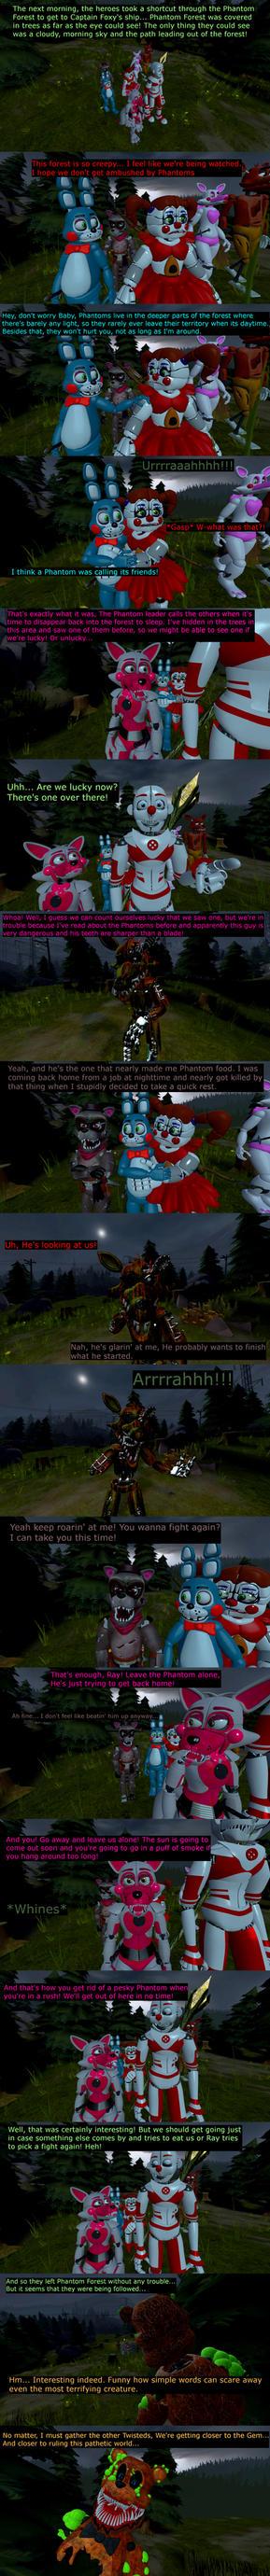 Bedtime Story 2 Part 8 by EmeraldWerewolfHeart